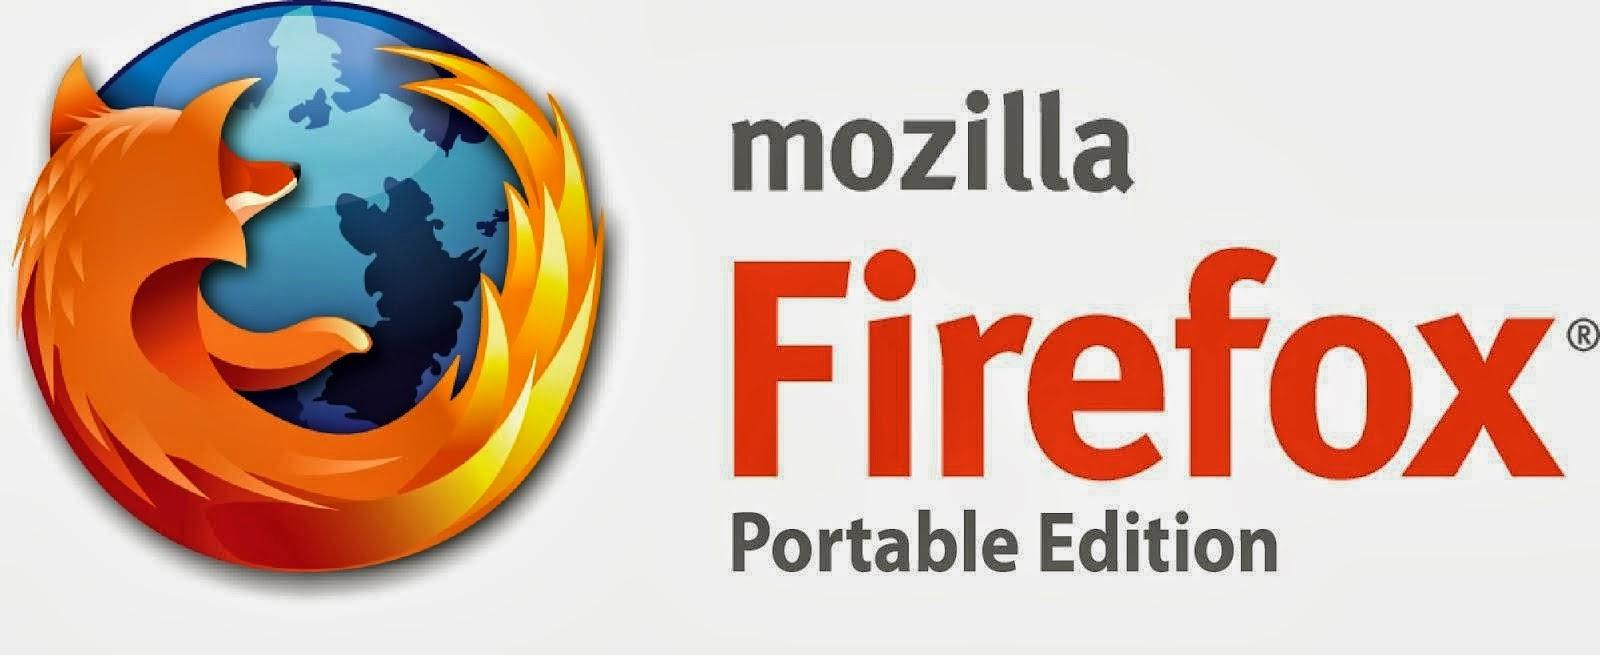 firefox on thumb drive jpg 853x1280